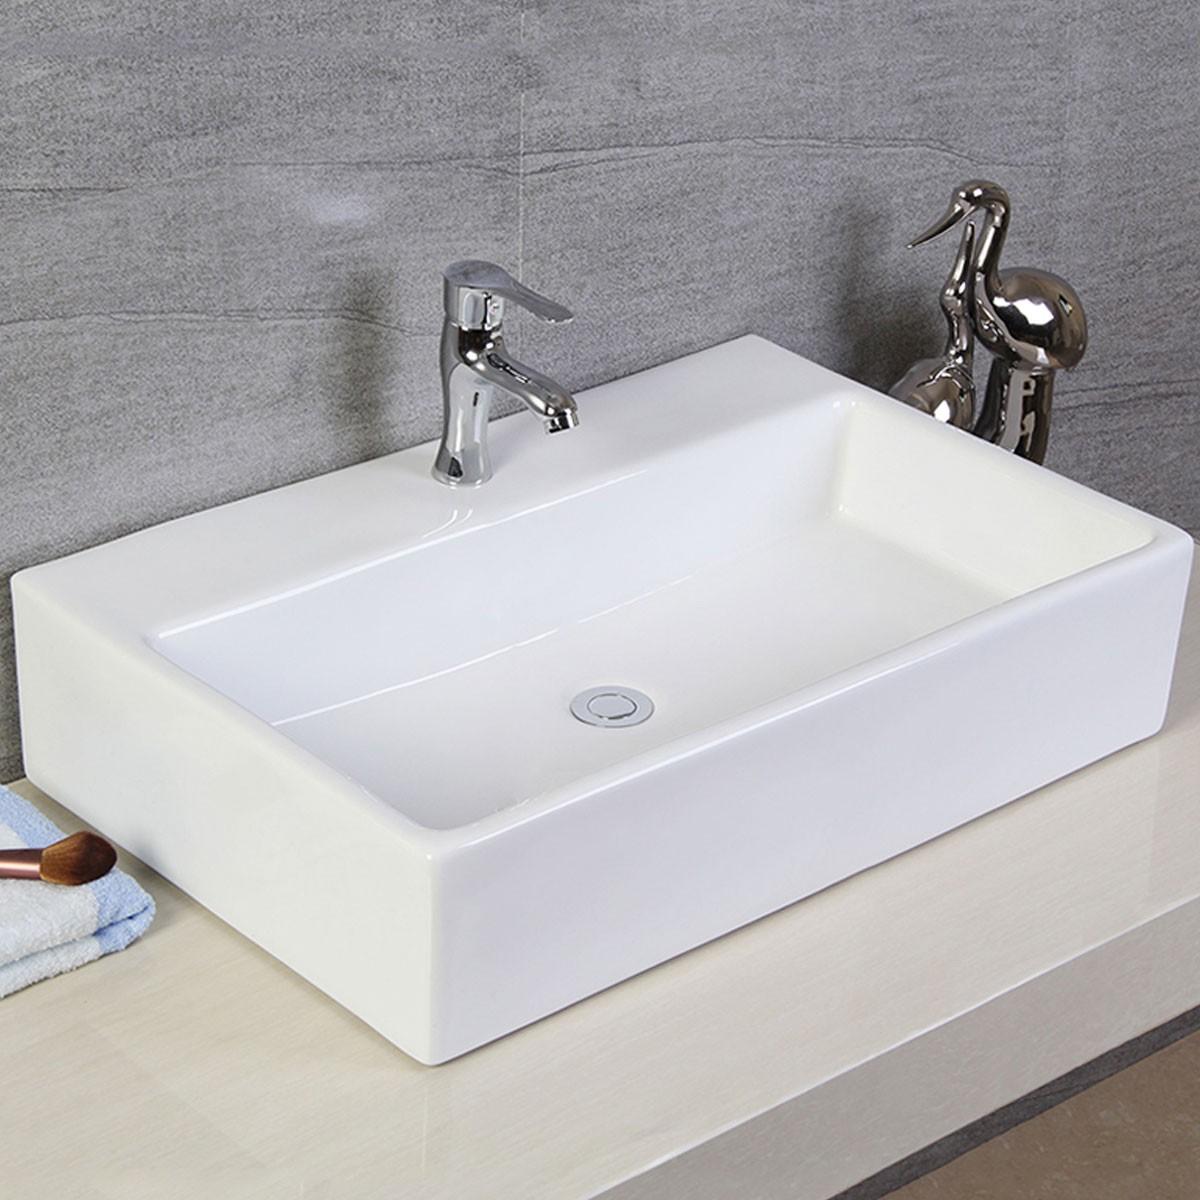 Decoraport White Rectangle Ceramic Above Counter Vessel Sink (CL-1099)